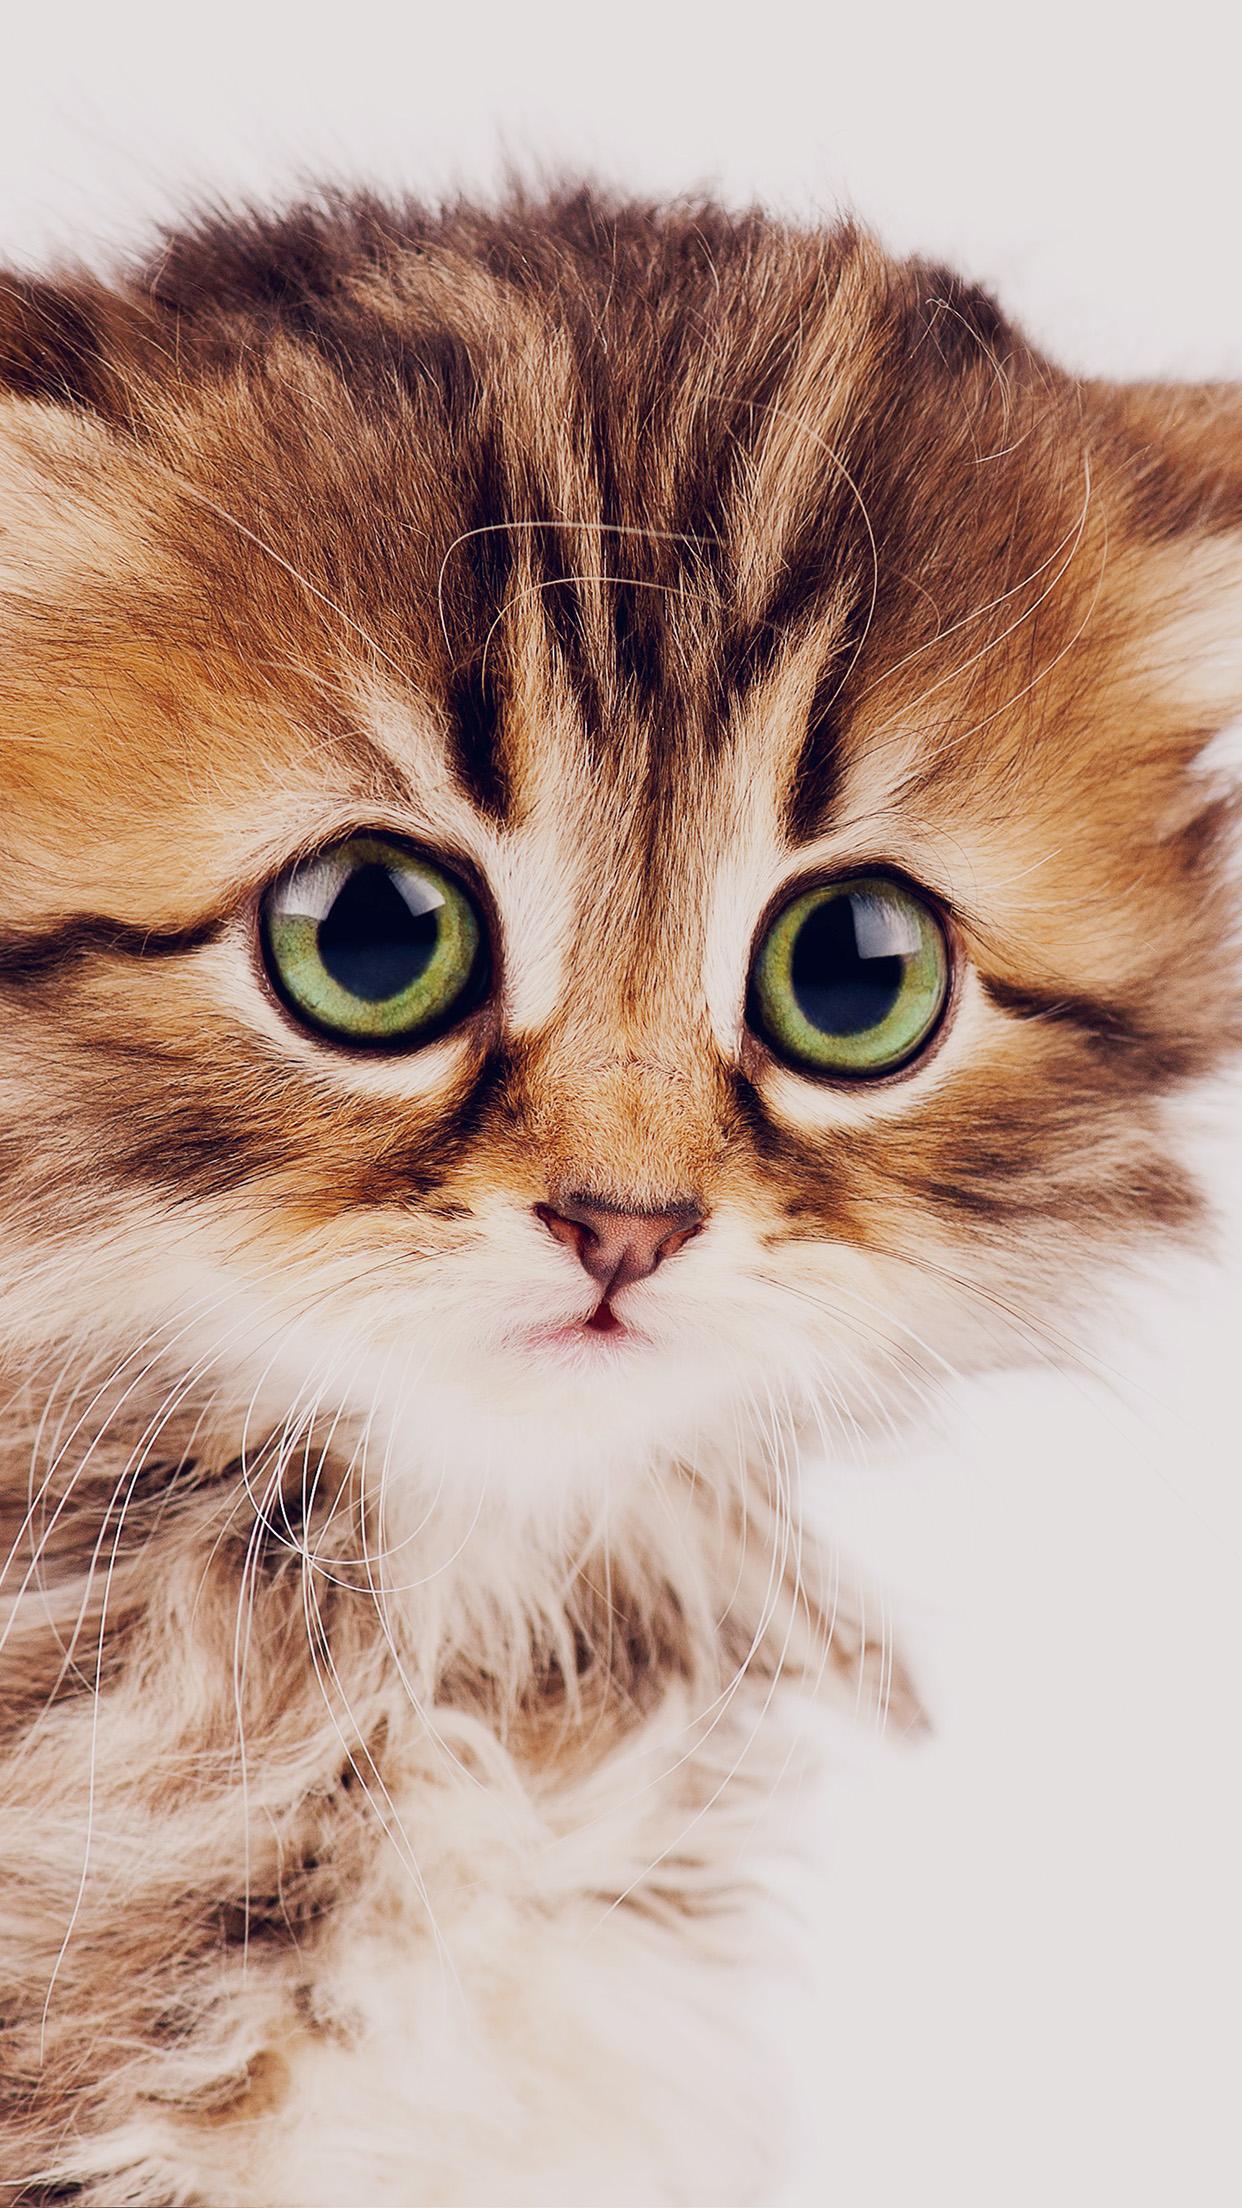 iphone7papers - ms23-sad-kitten-cat-animal-nature-cute